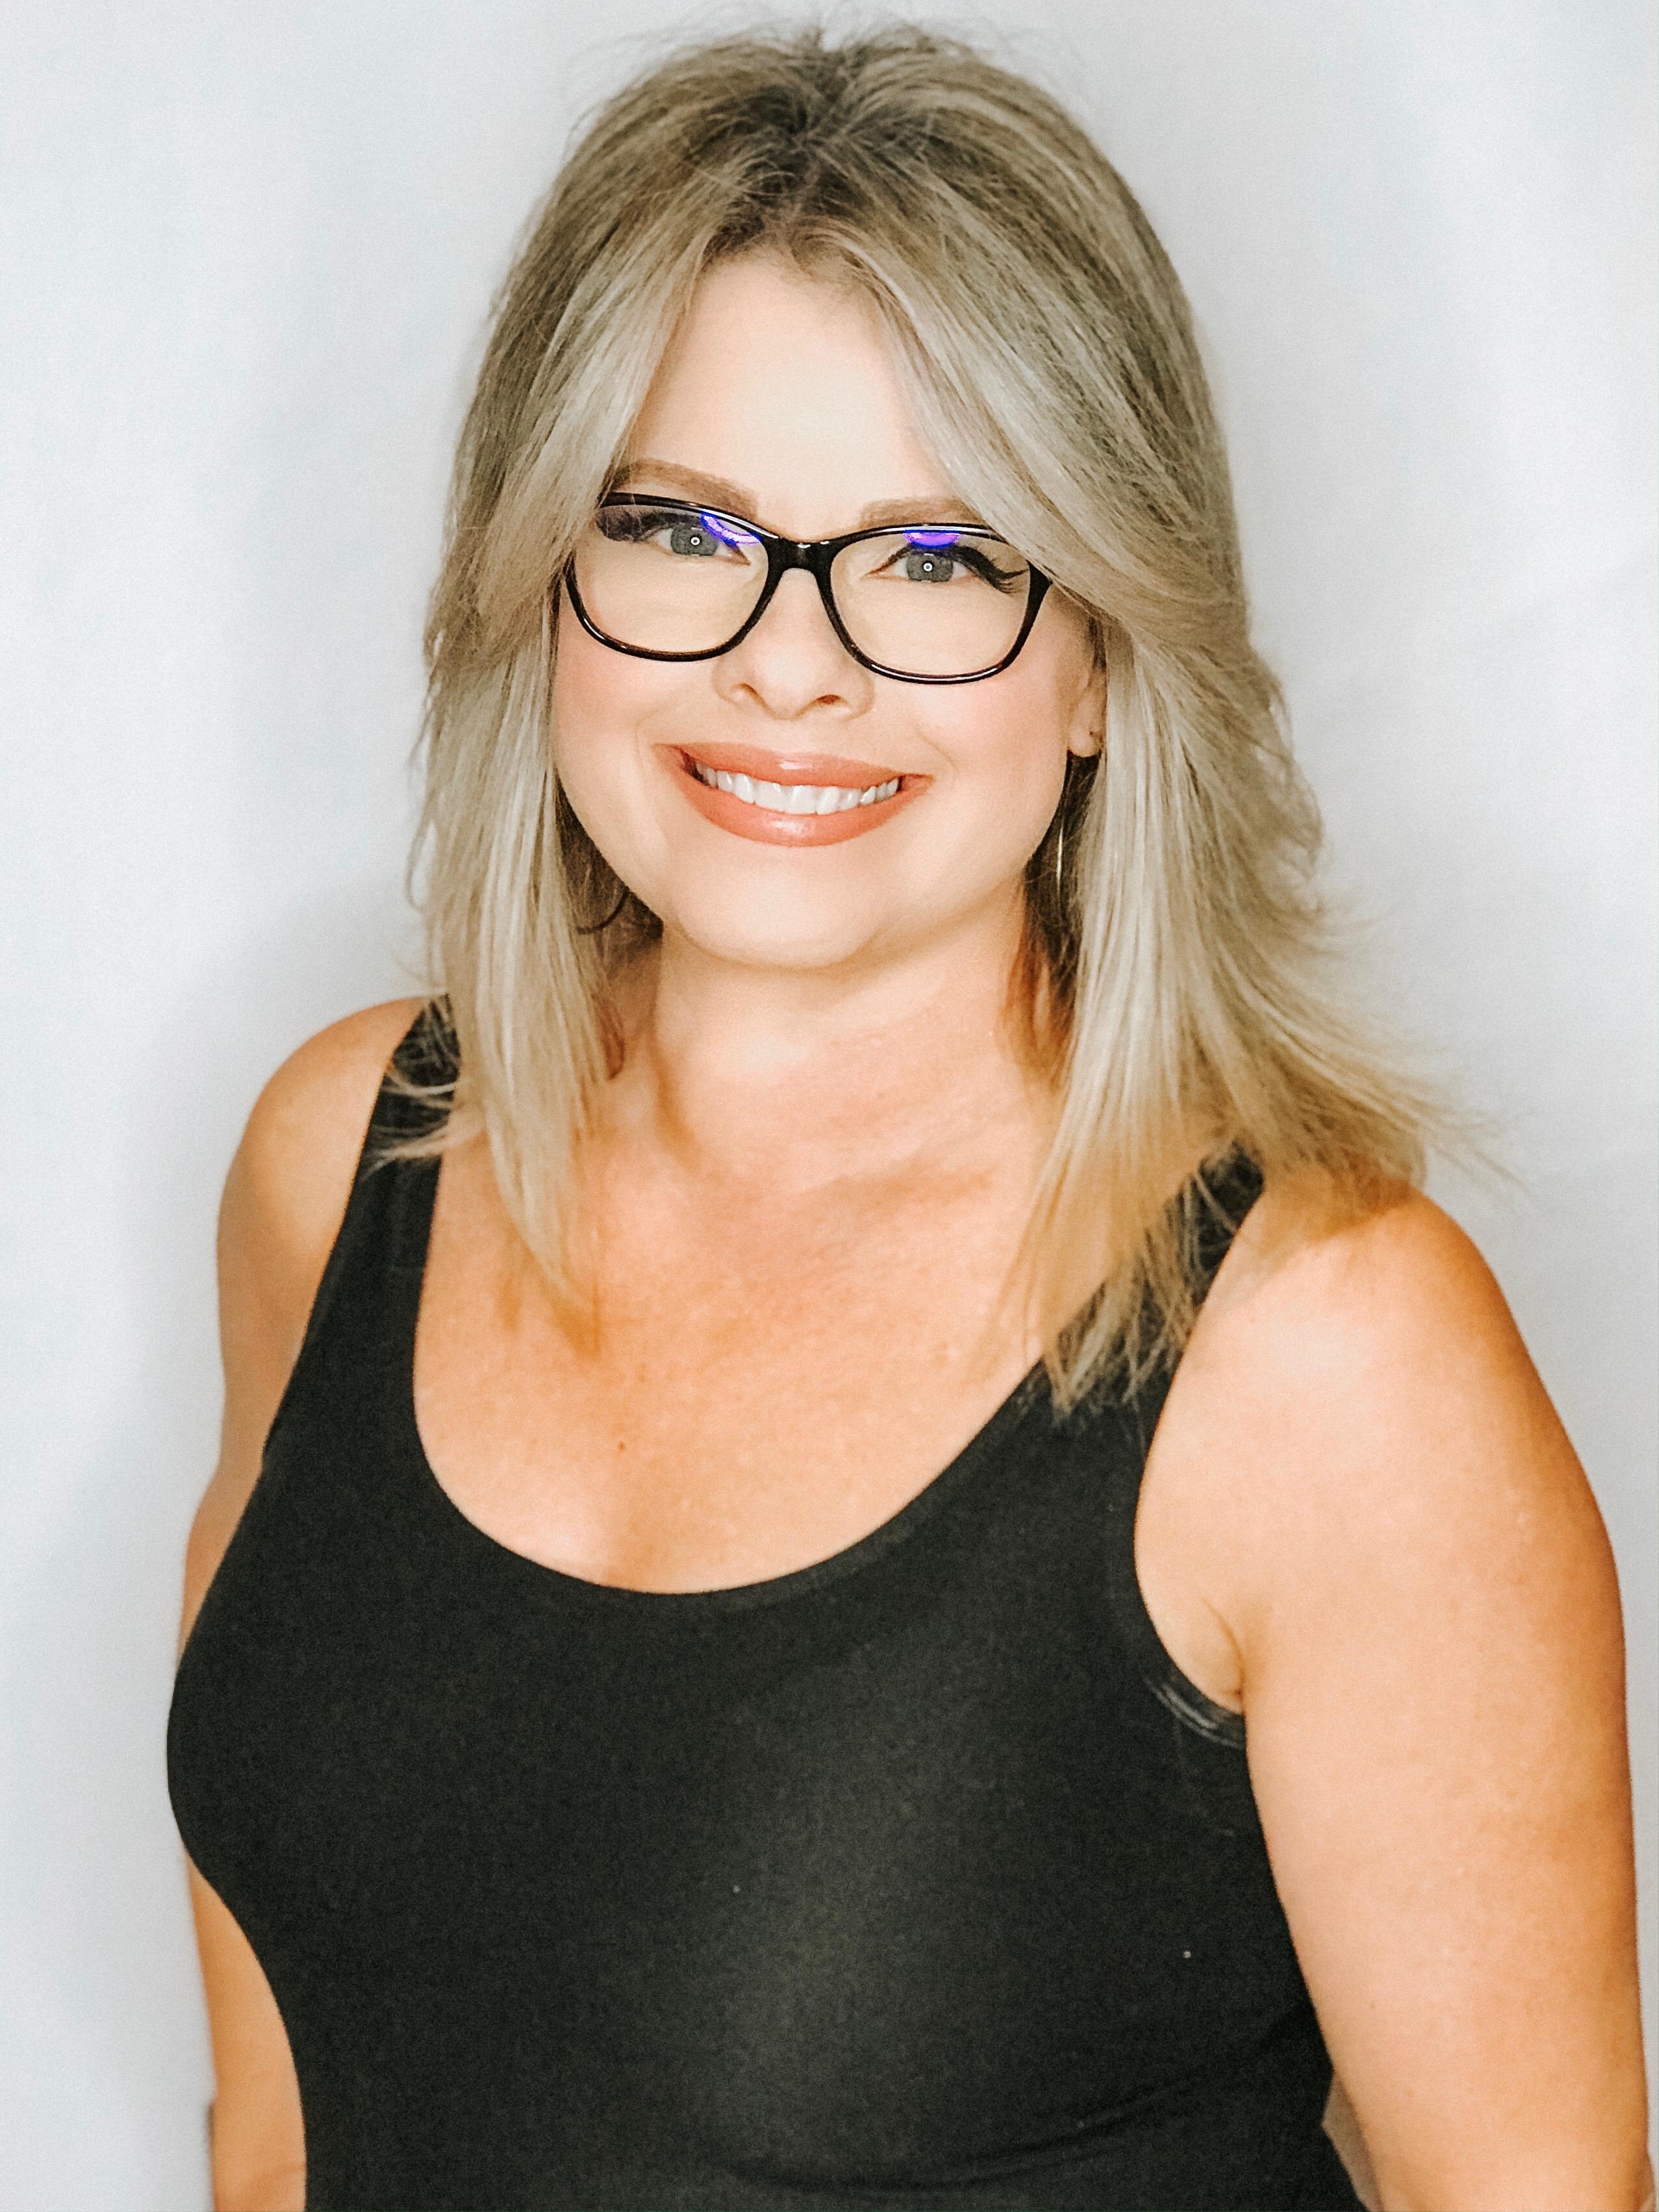 Julie McDill